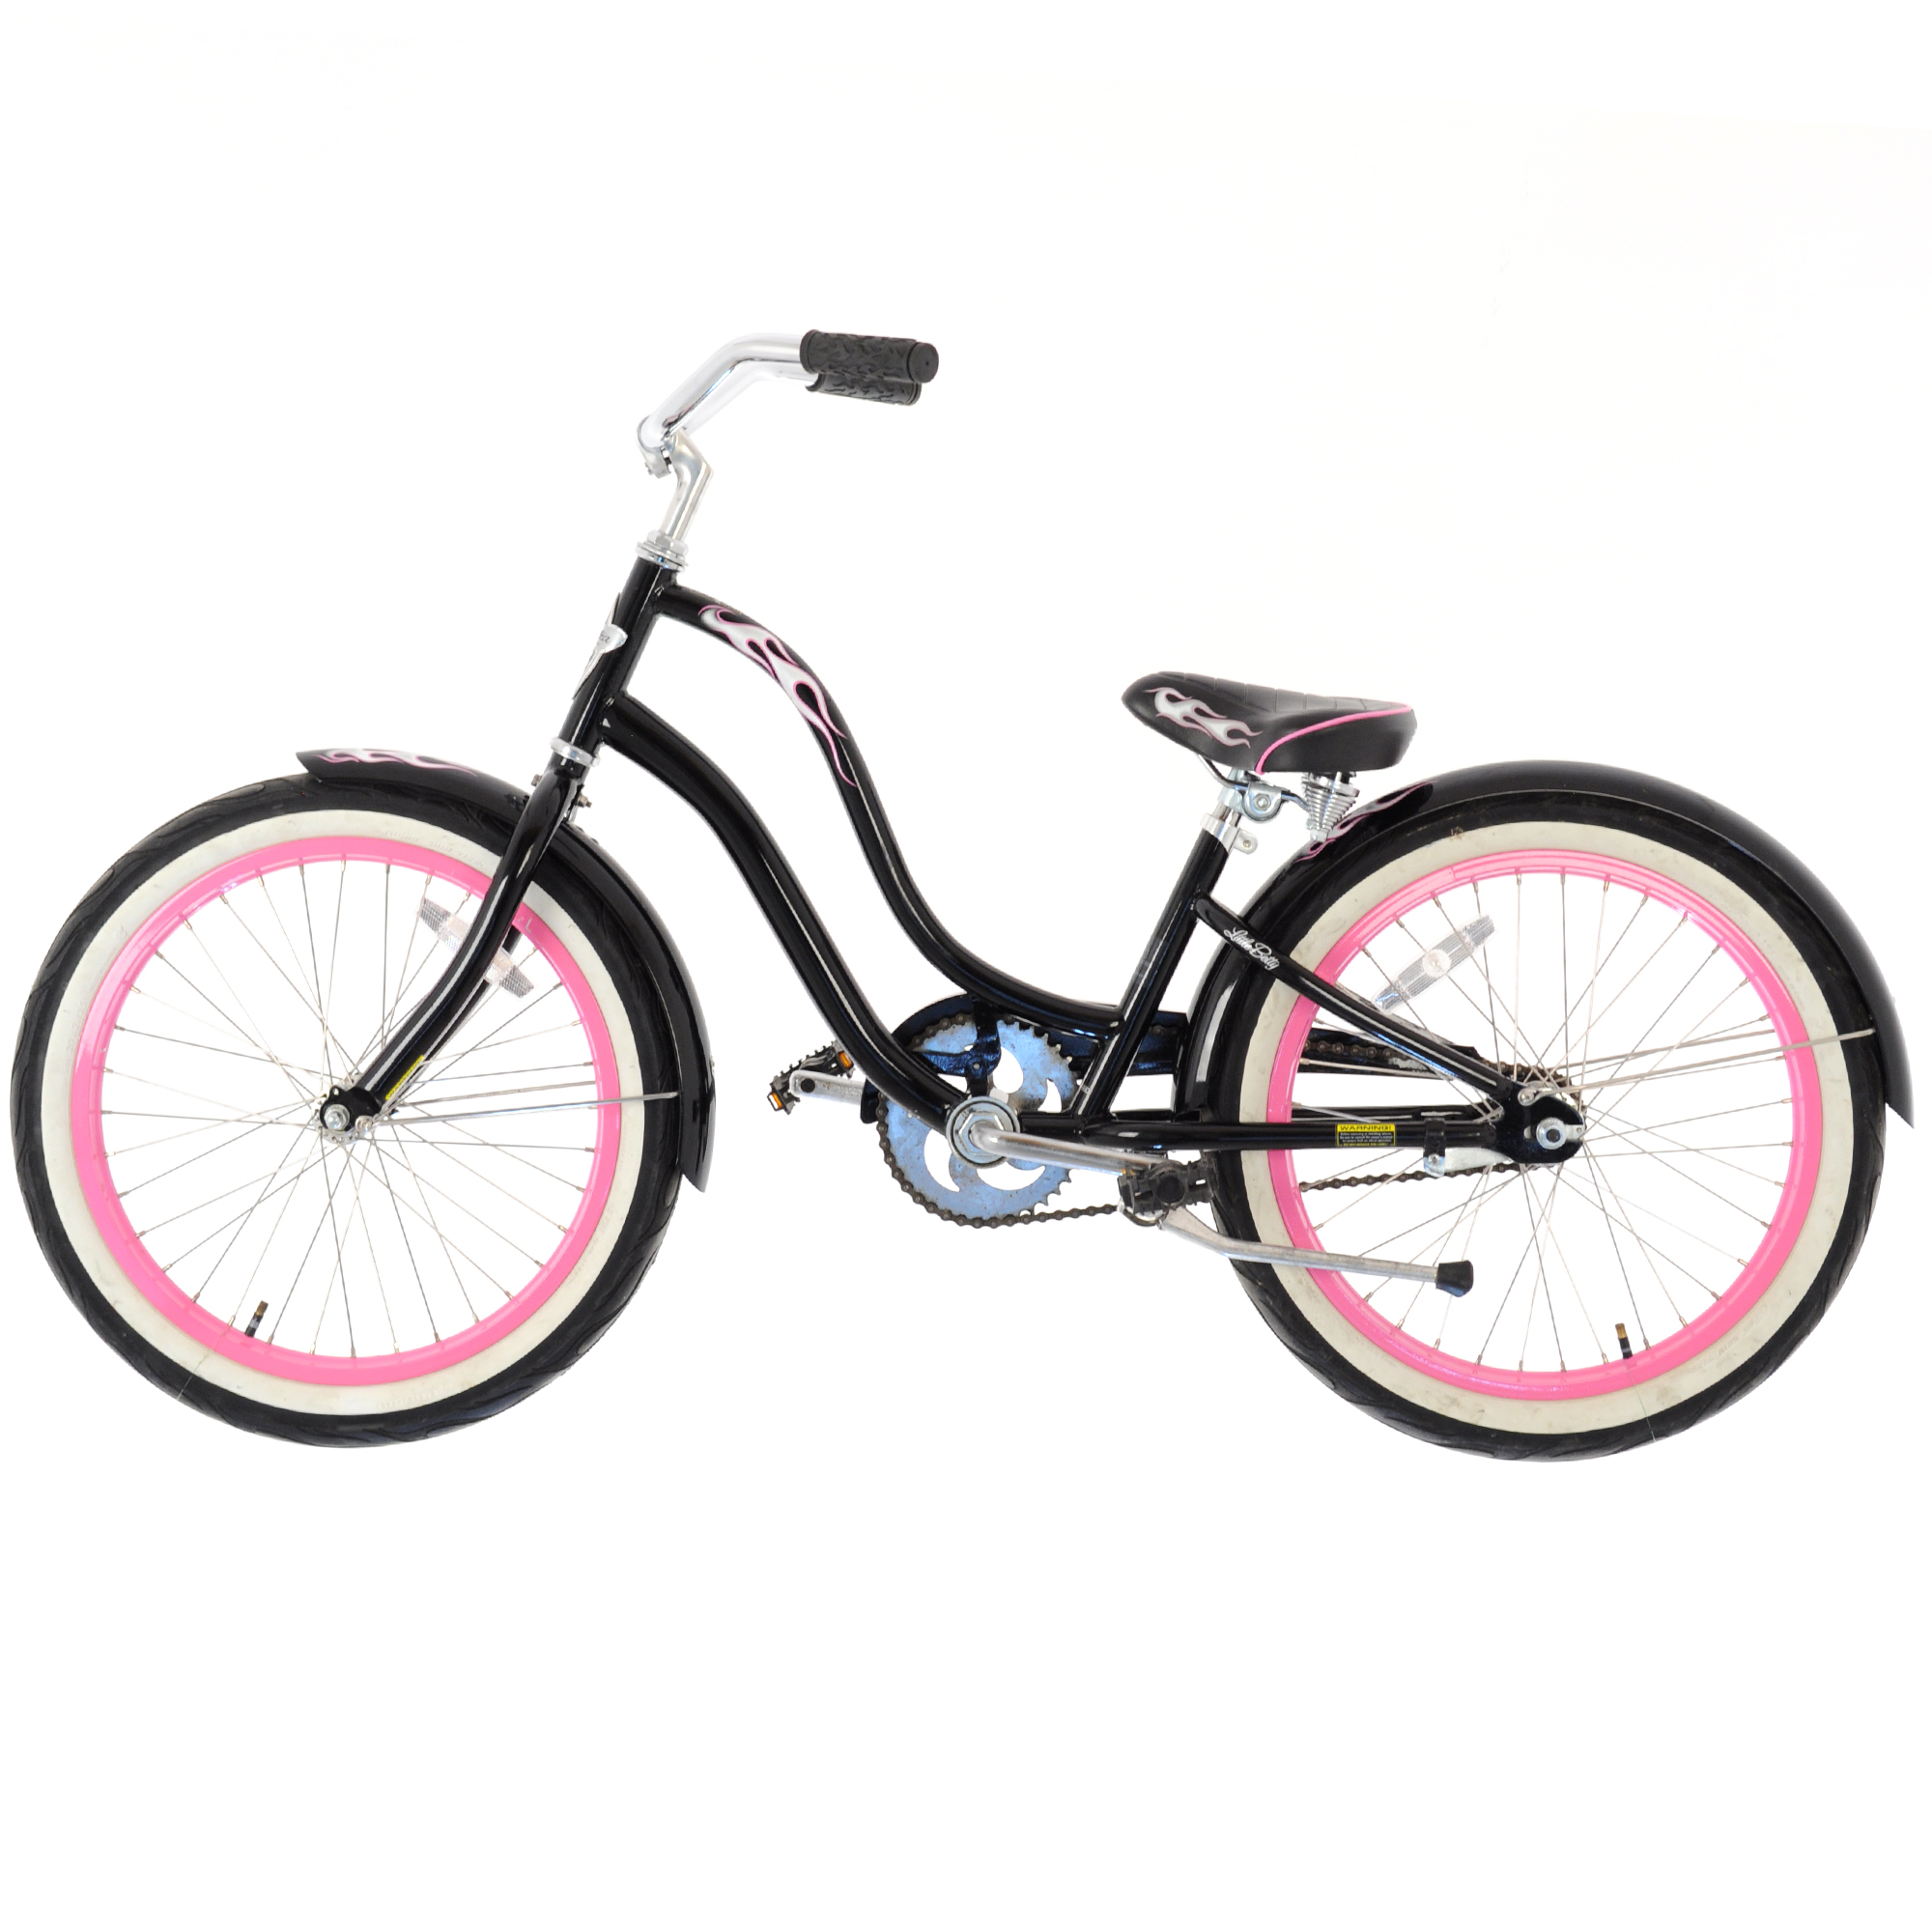 Electra Black Betty 3 speed Cruiser Ladies bike | eBay